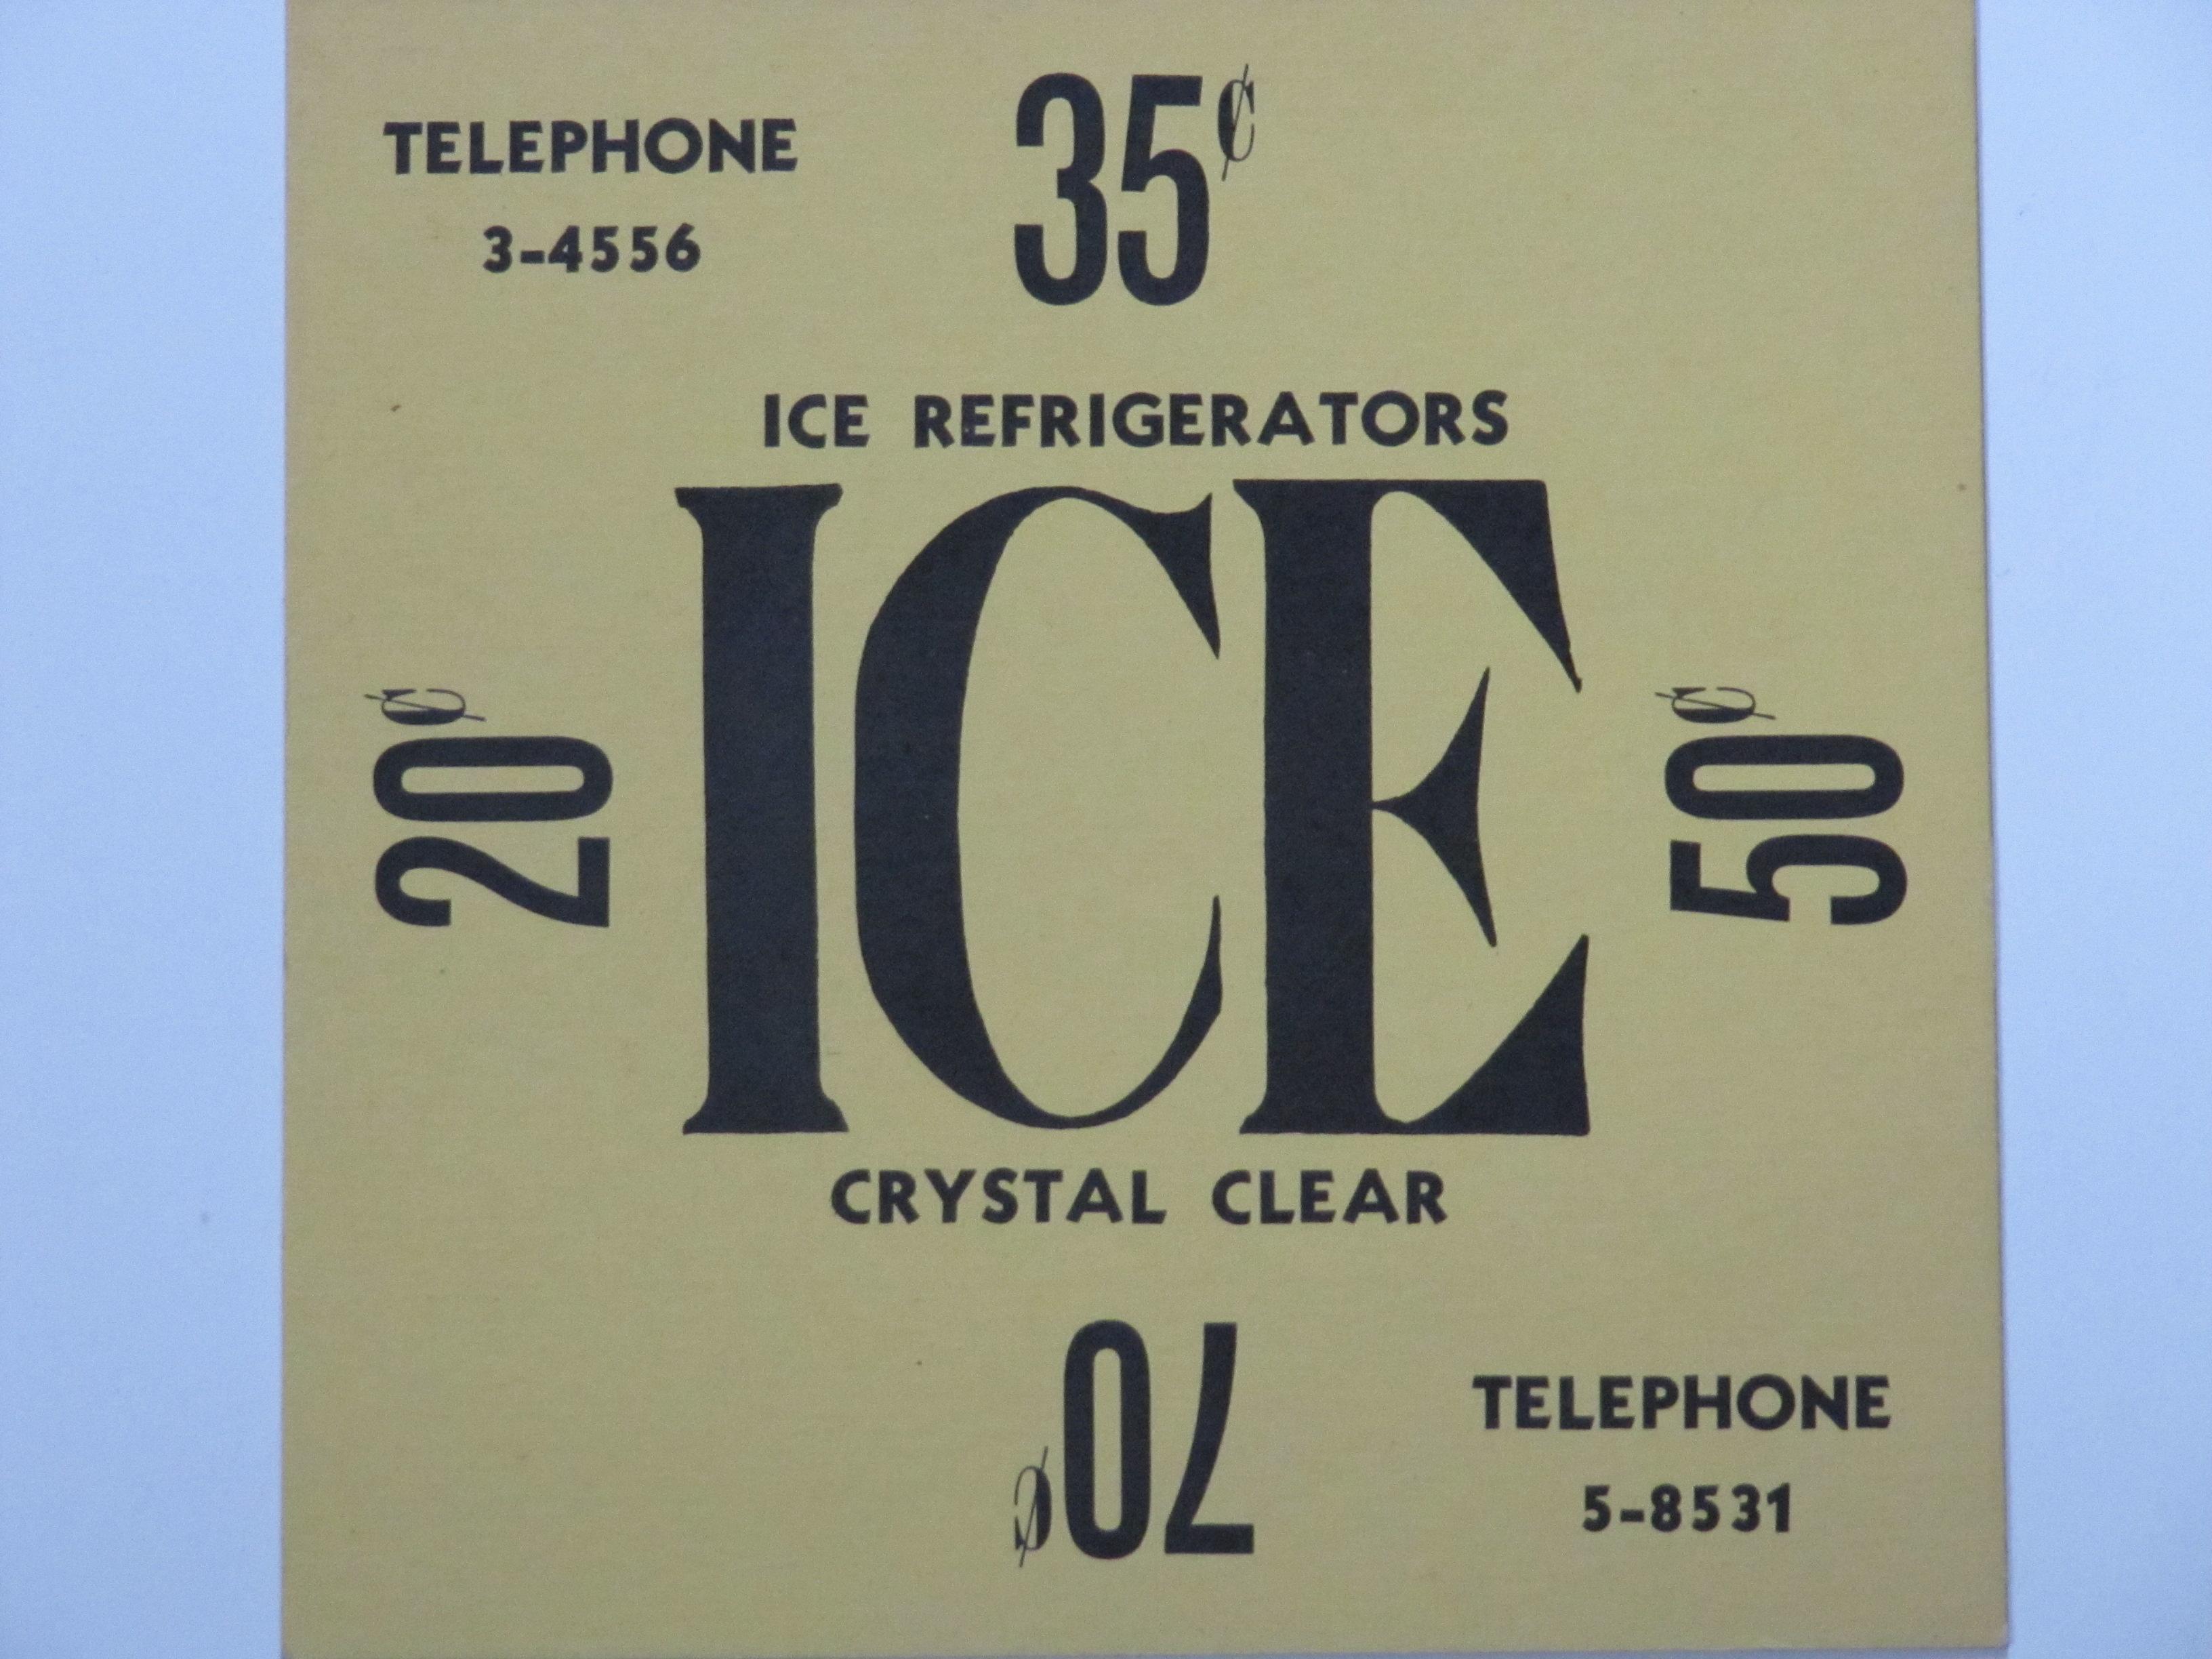 Ice Card Ph3-4556